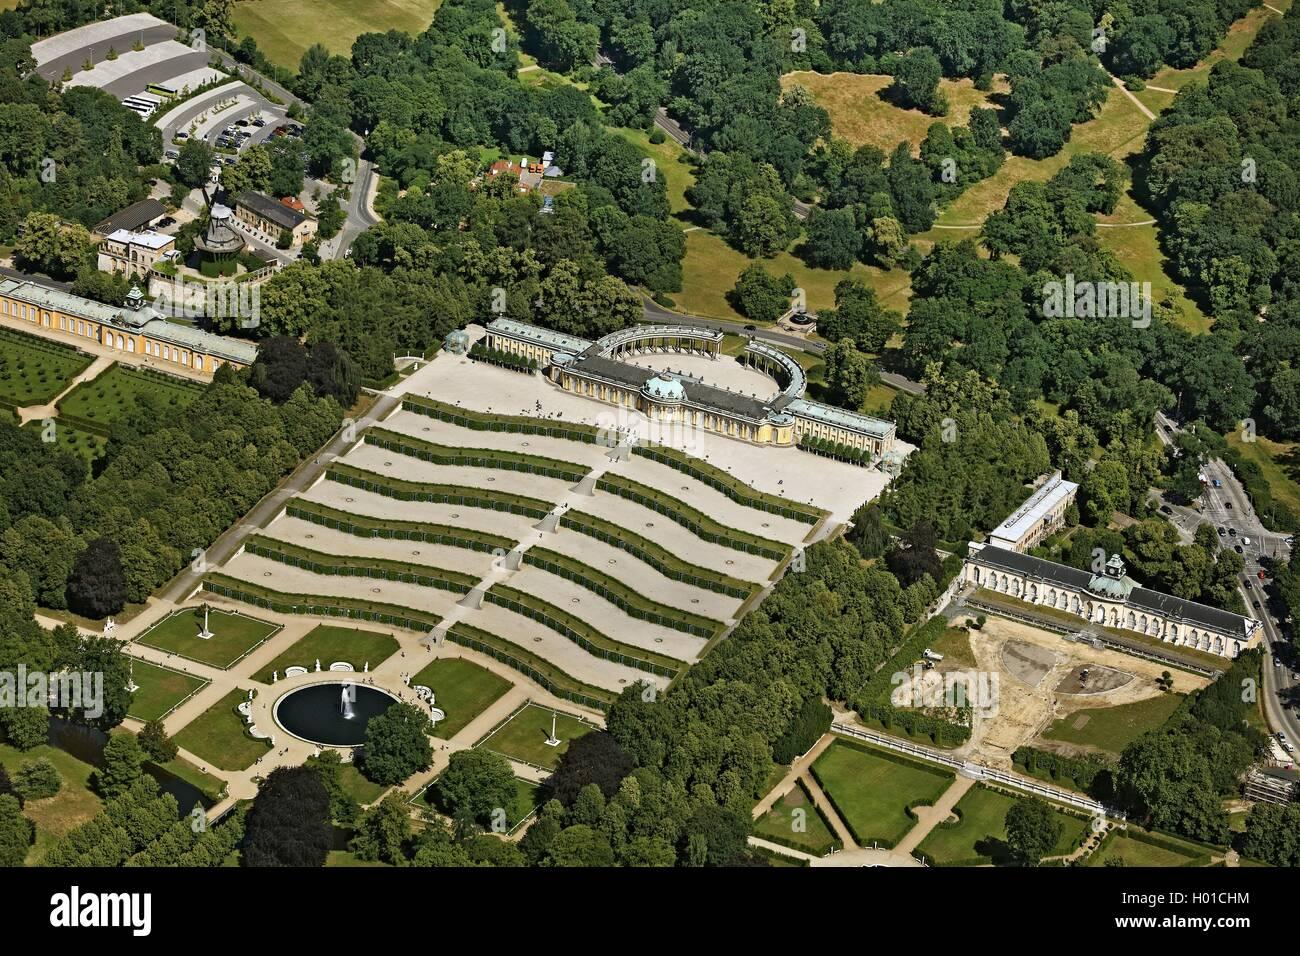 Schloss Sanssouci, 20.06.2016, Luftbild, Deutschland, Brandenburg, Potsdam | castle Sanssouci, 20.06.2016, aerial Stock Photo